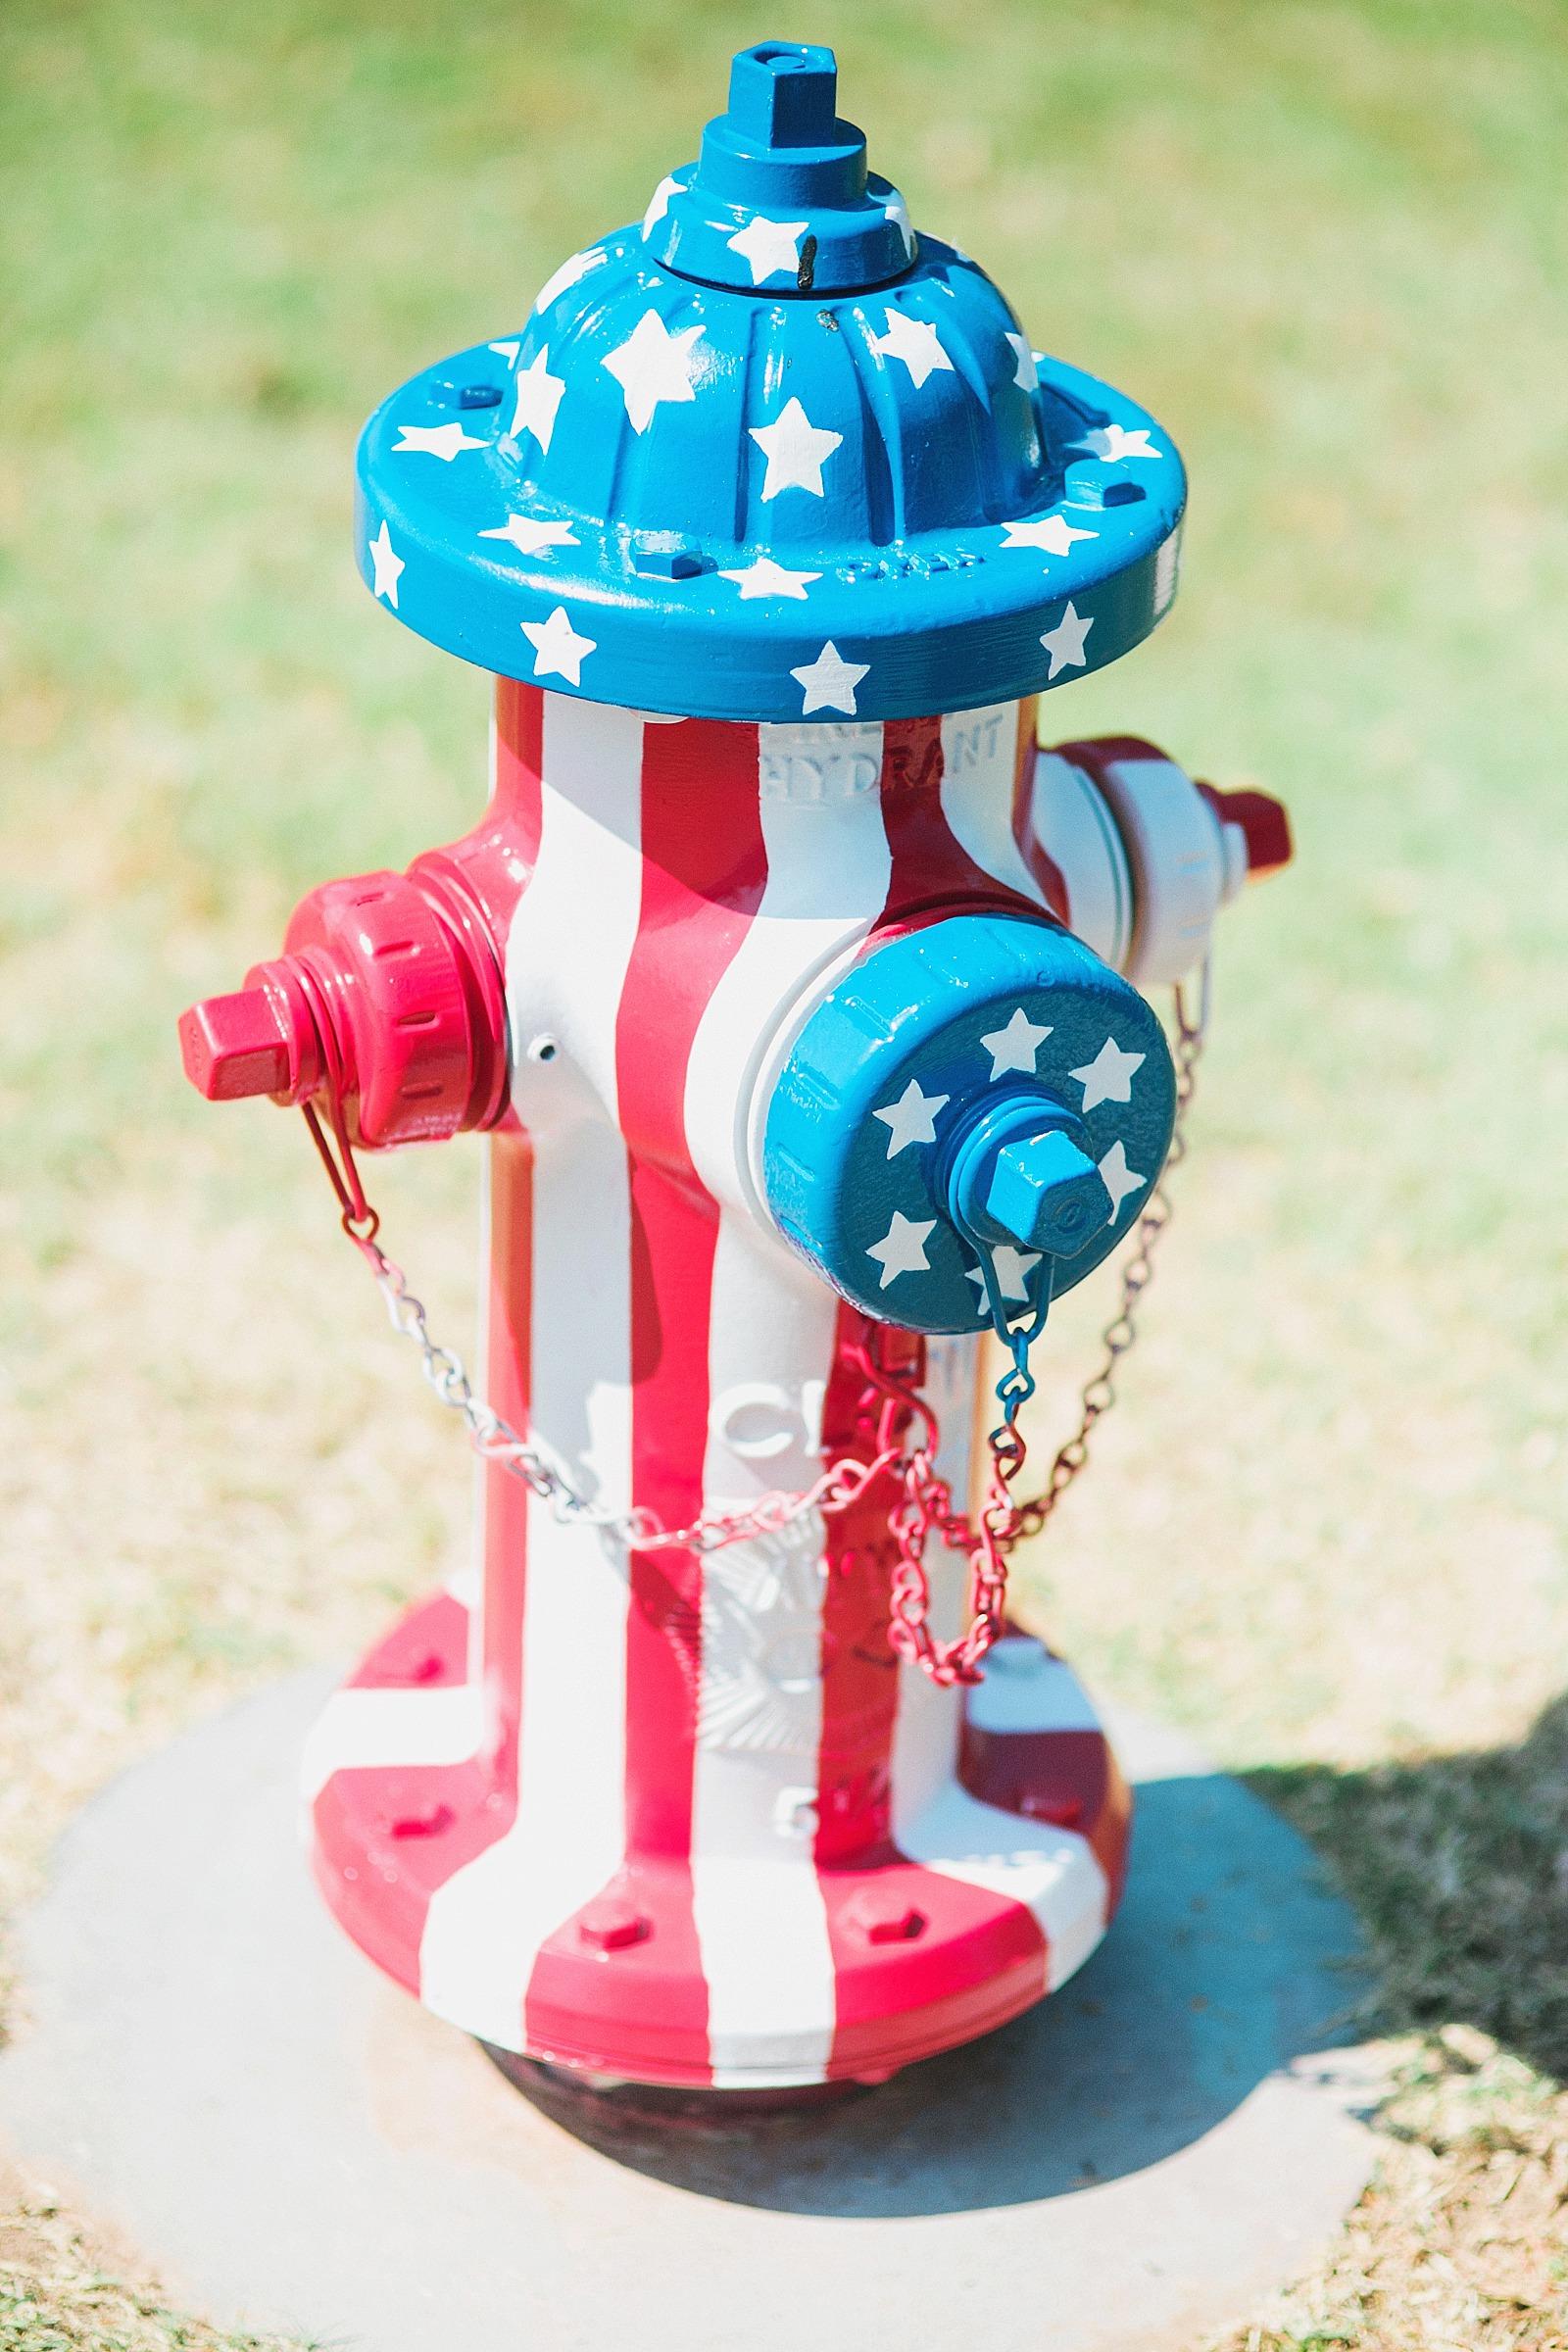 Patriotic American Flag Fire Hydrant | Diana Elizabeth